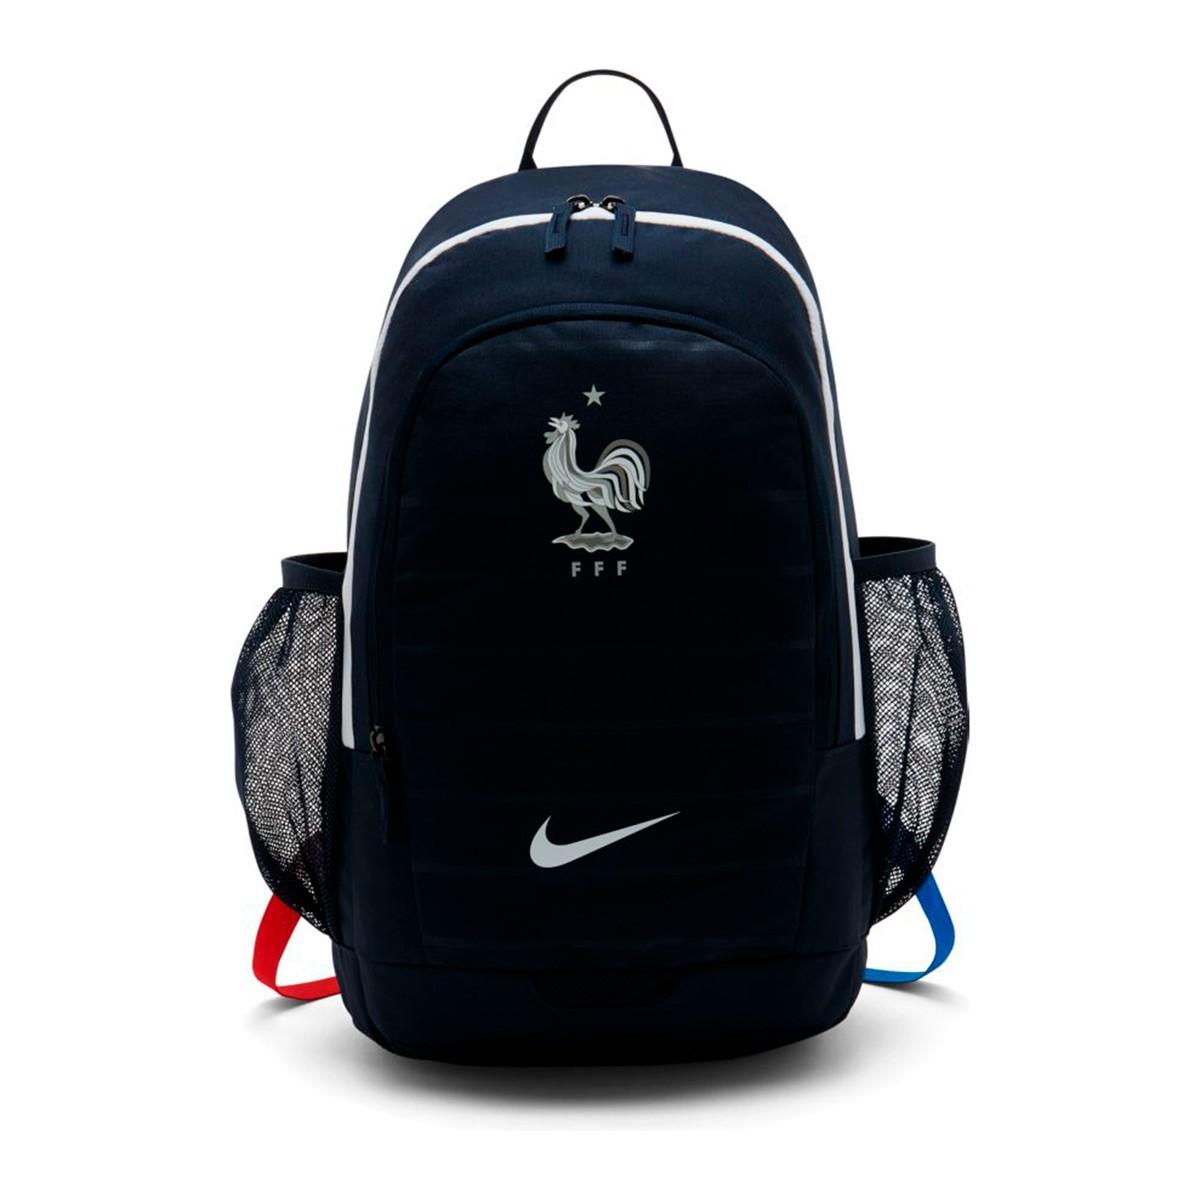 0b4c07a4b8c16 Mochila Nike Stadium Francia 2018-2019 Obsidian-White - Leaked soccer